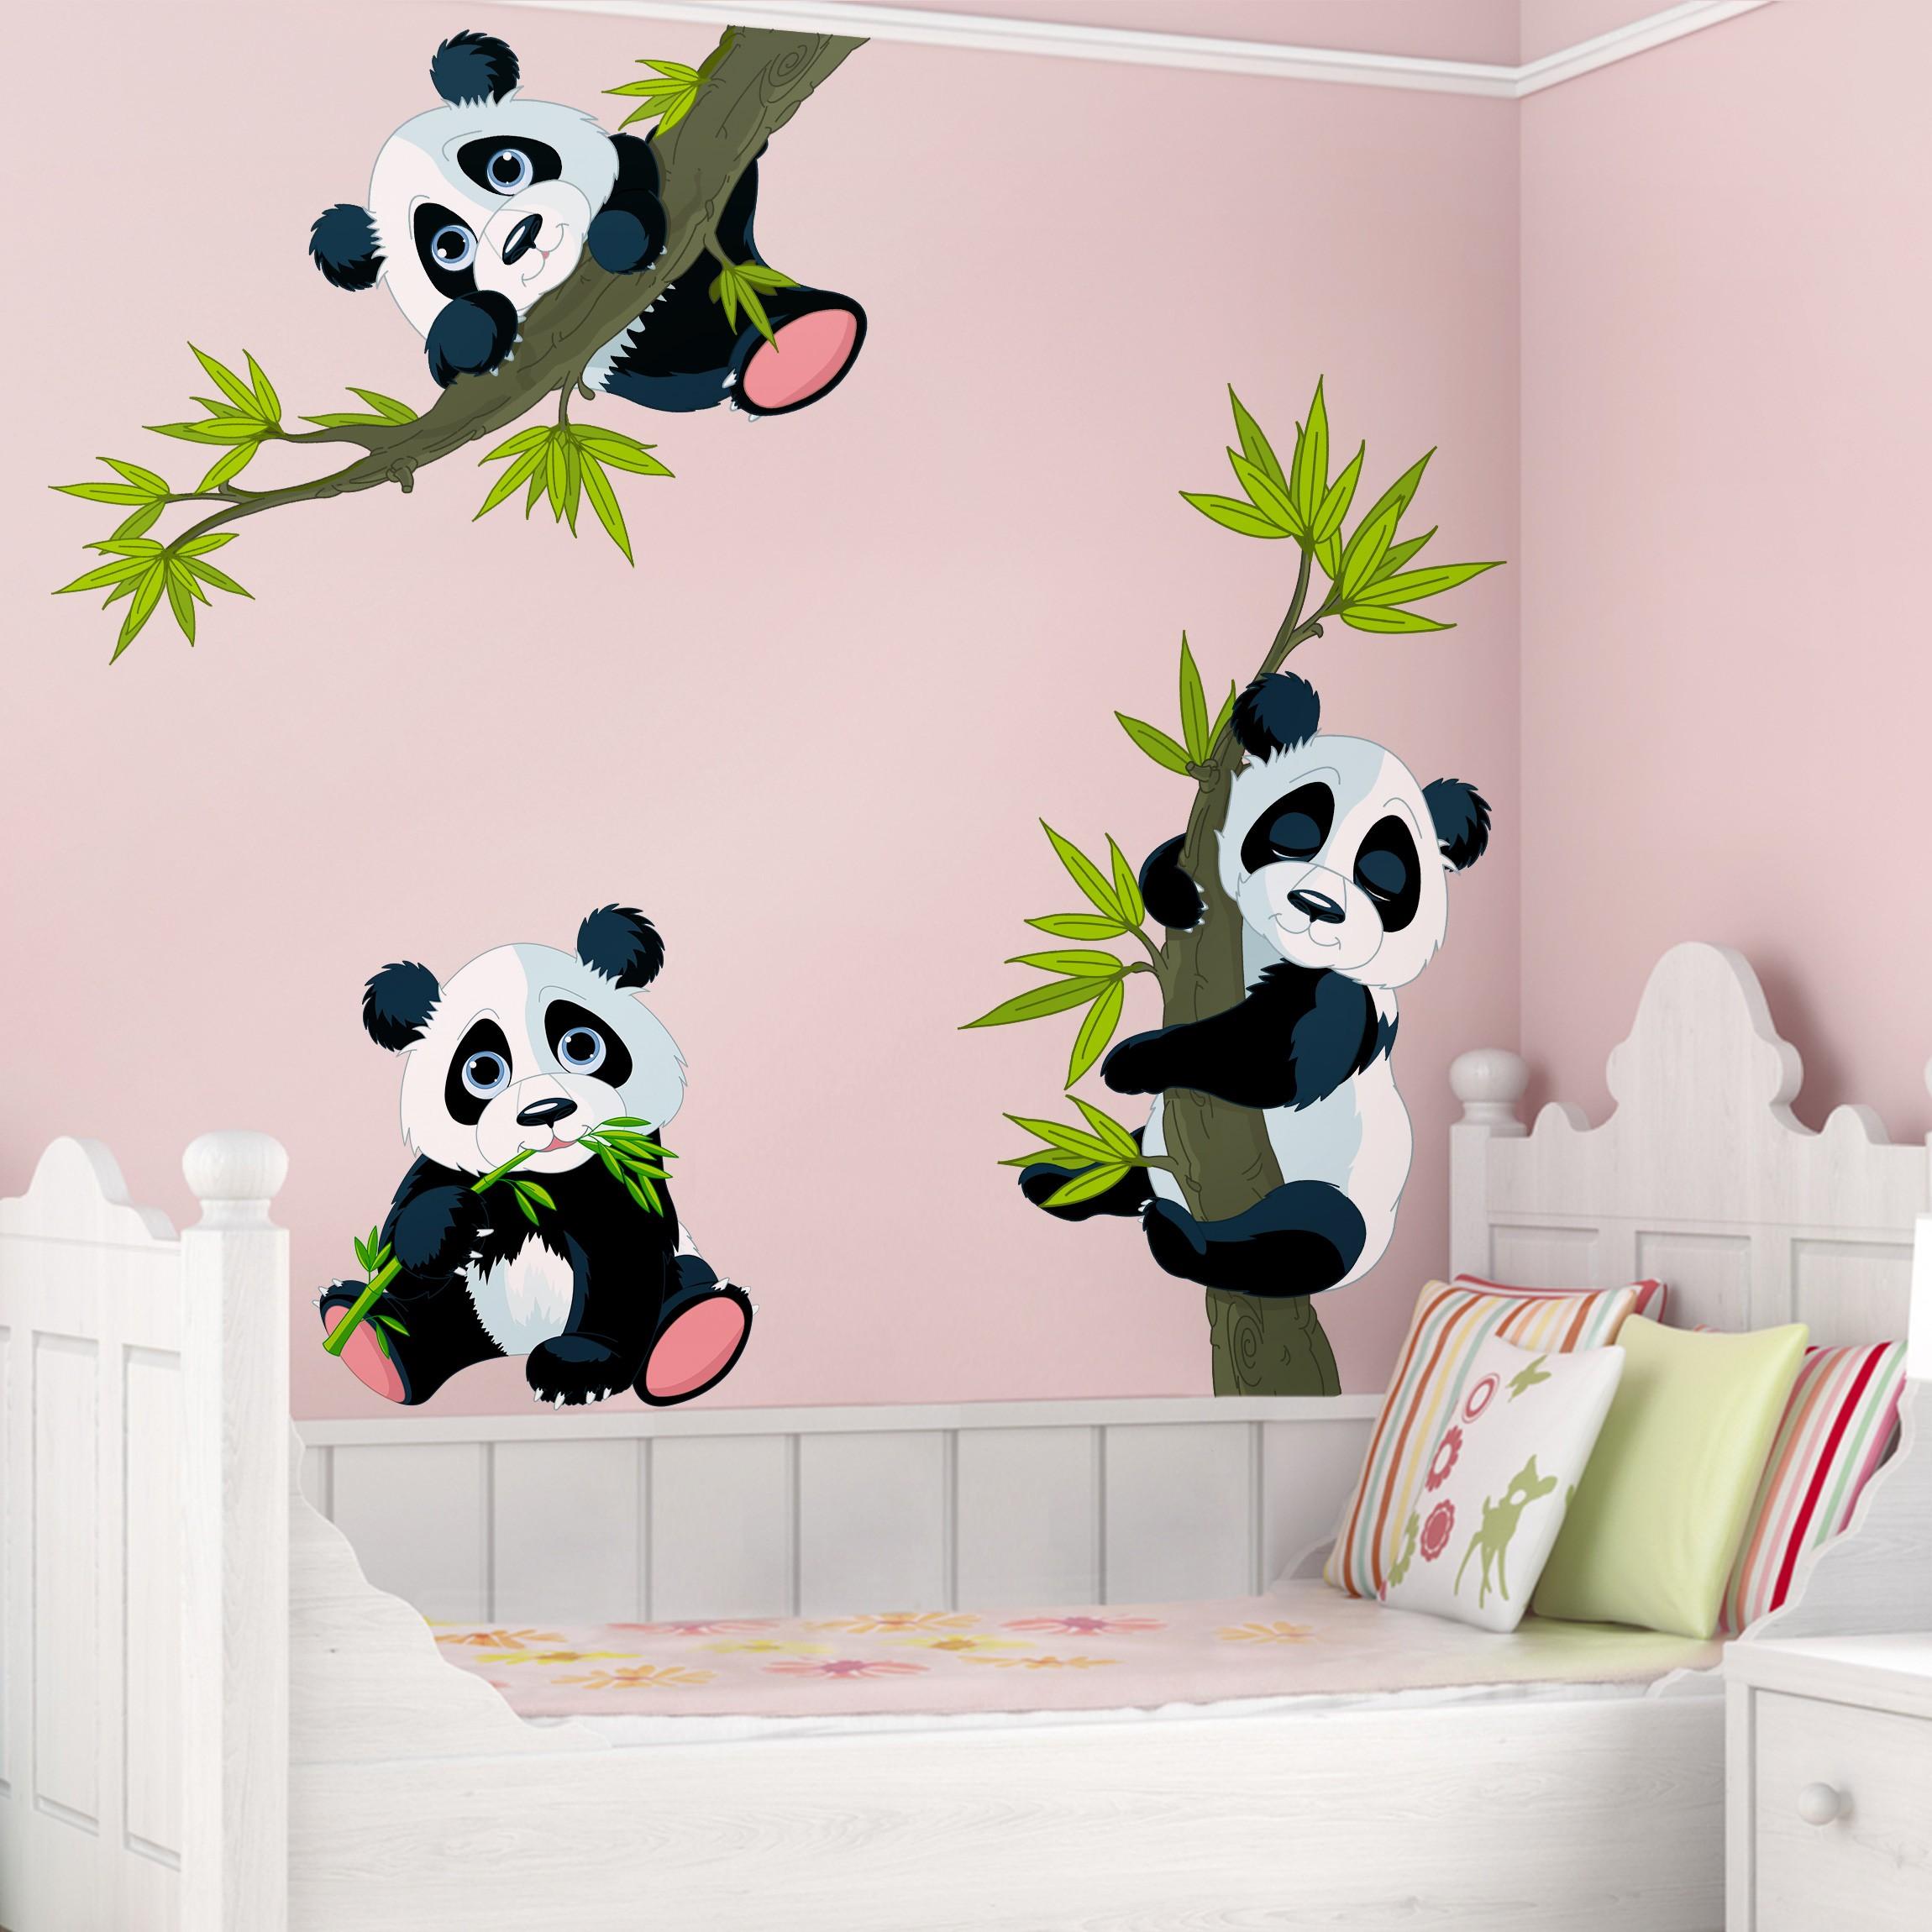 Full Size of Wandaufkleber Kinderzimmer Wandtattoo Pandabren Set Regal Sofa Weiß Regale Kinderzimmer Wandaufkleber Kinderzimmer